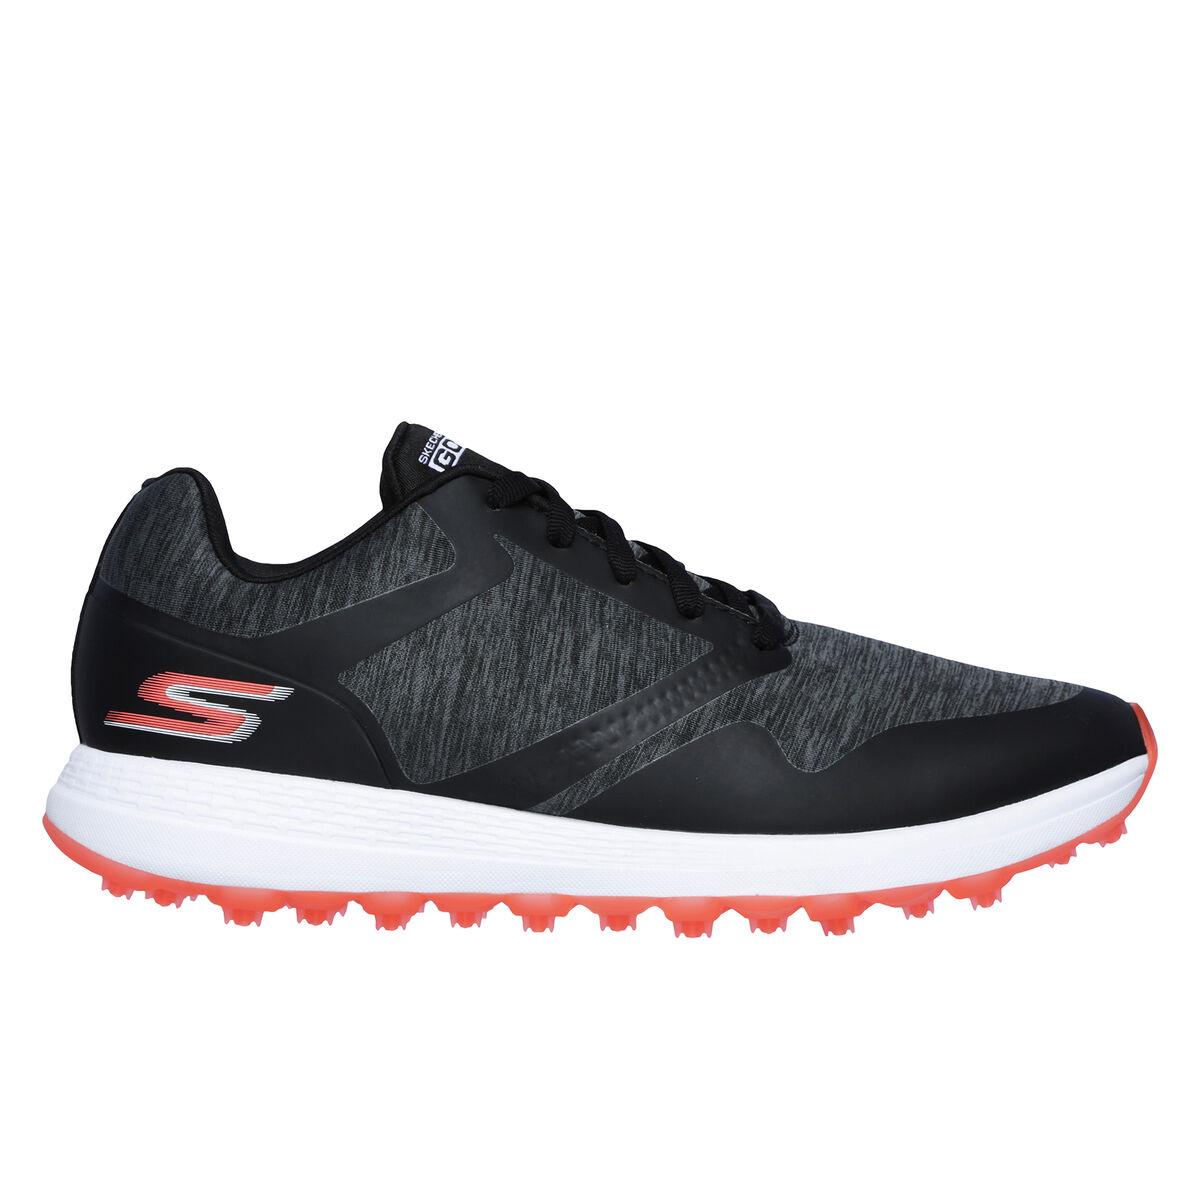 38e5196bb19ab Skechers GO GOLF Max Cut Women's Golf Shoe - Black/Pink Zoom Image